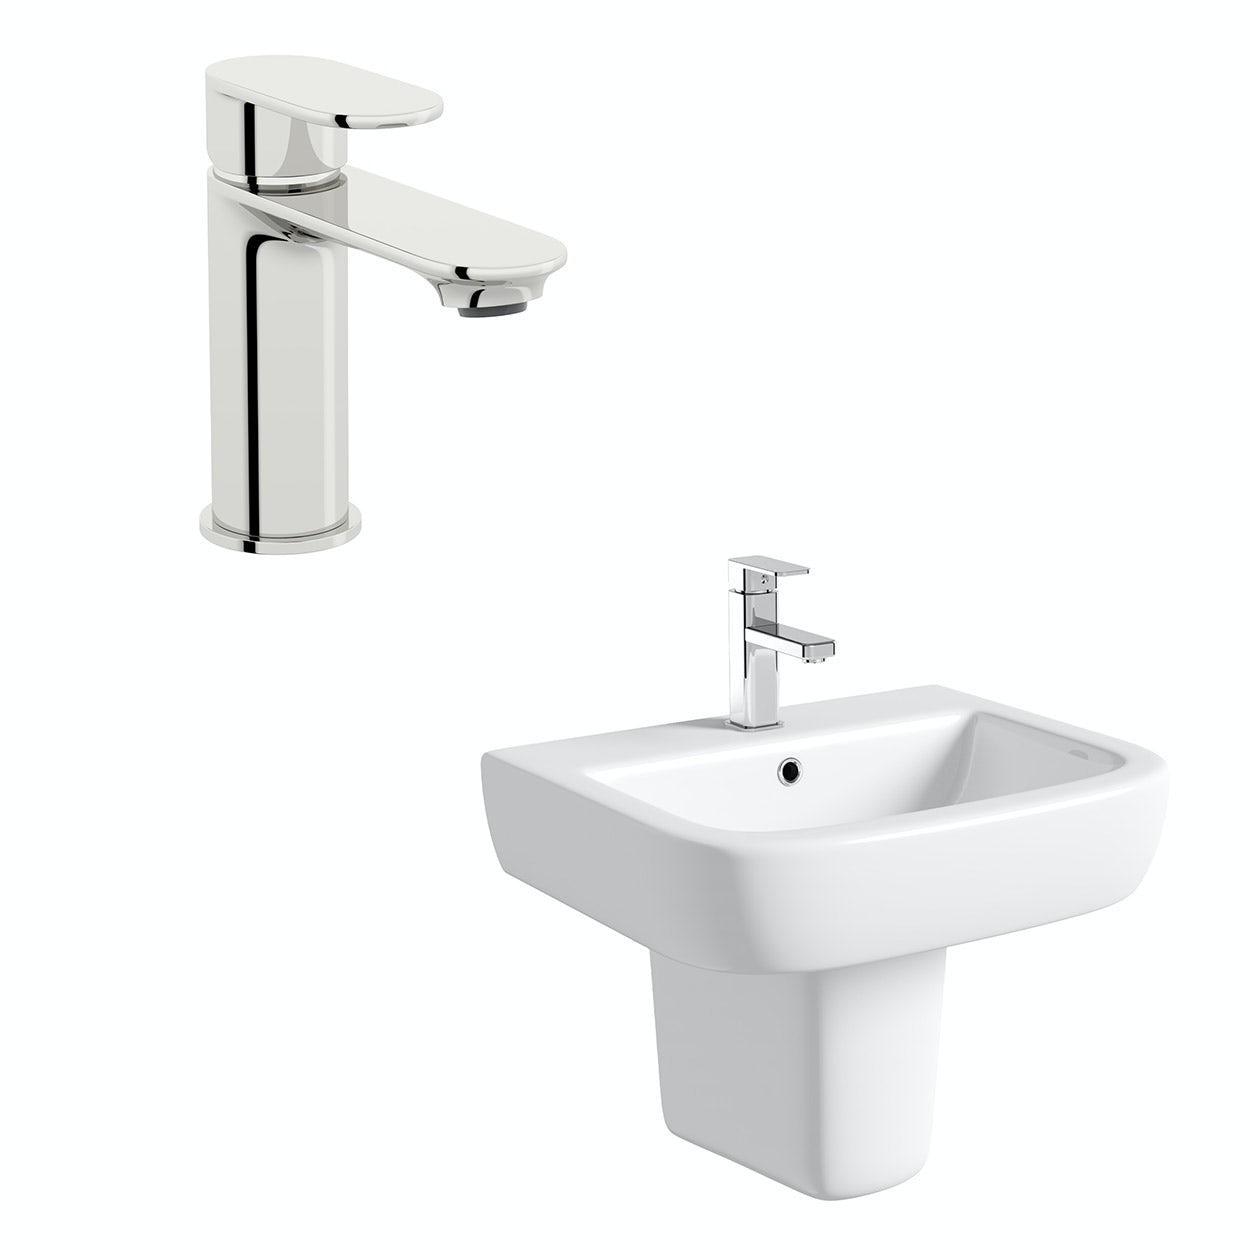 Mode Ellis 1 tap hole semi pedestal basin 560mm with tap